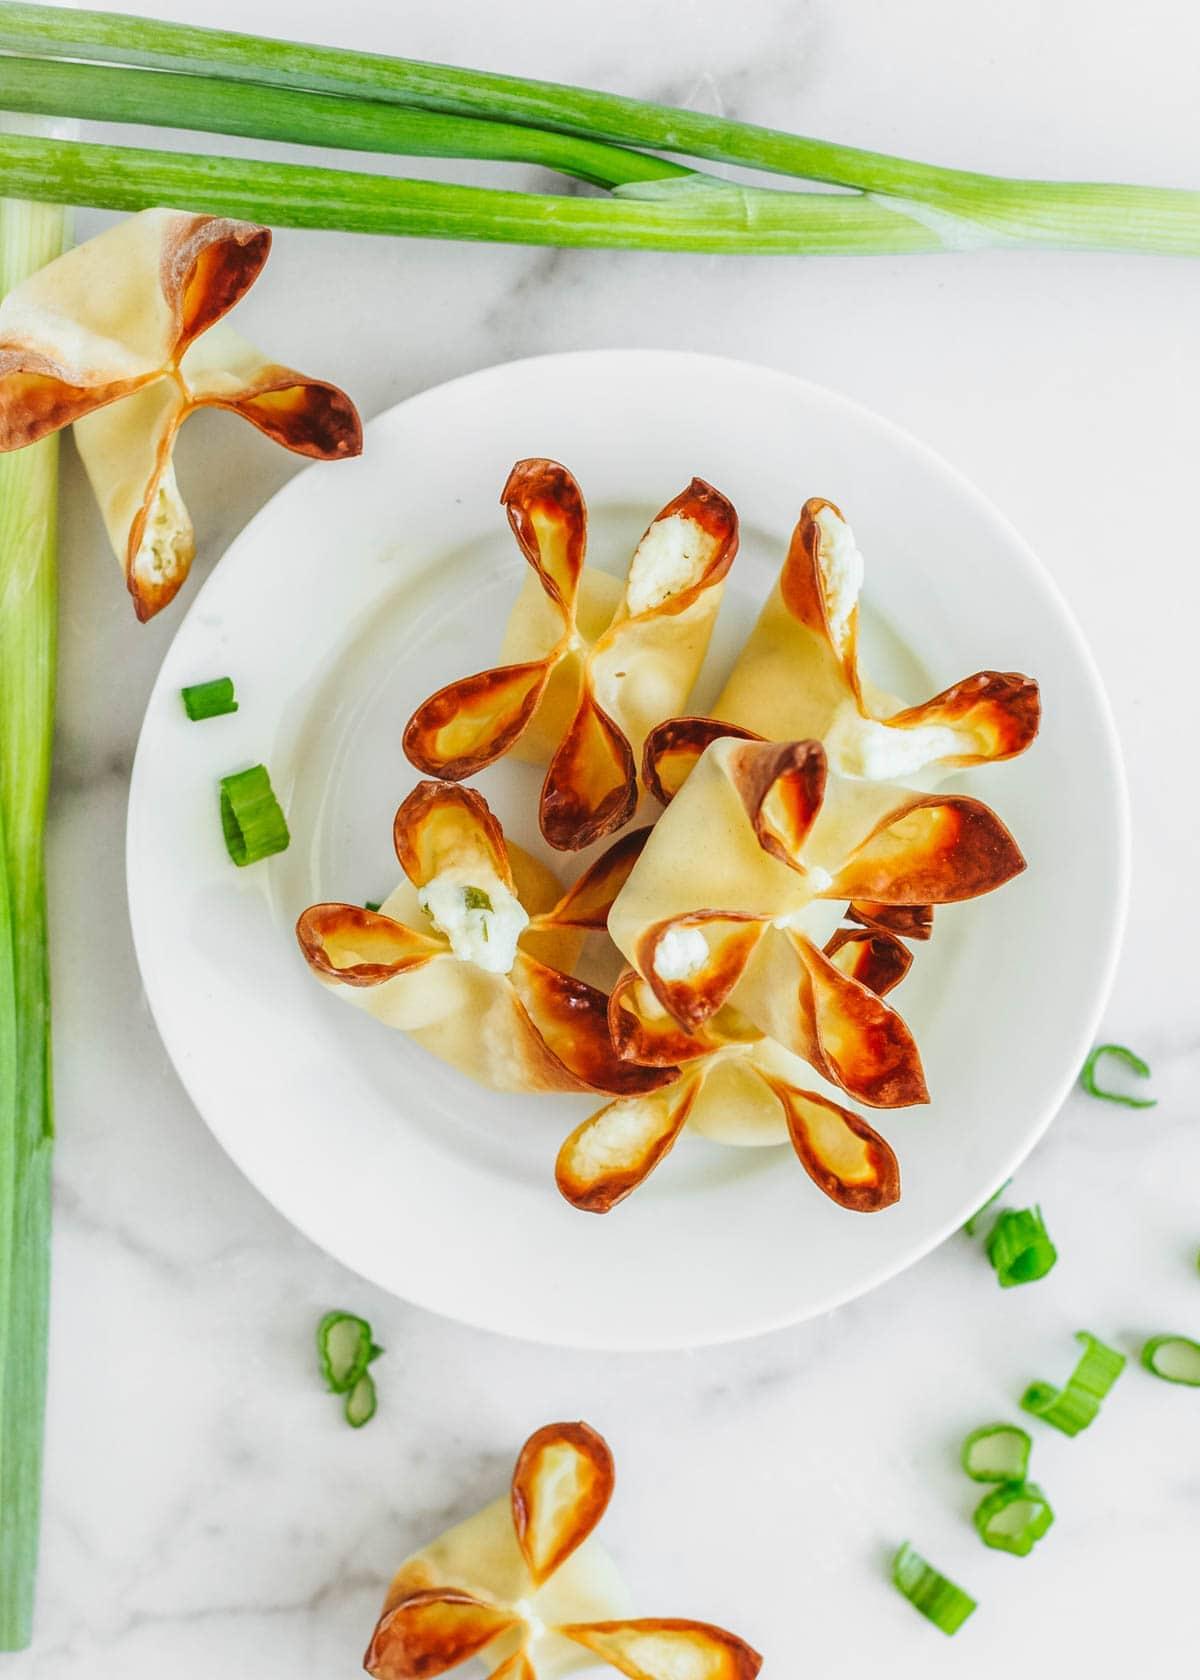 Baked cream cheese rangoons piled onto a plate